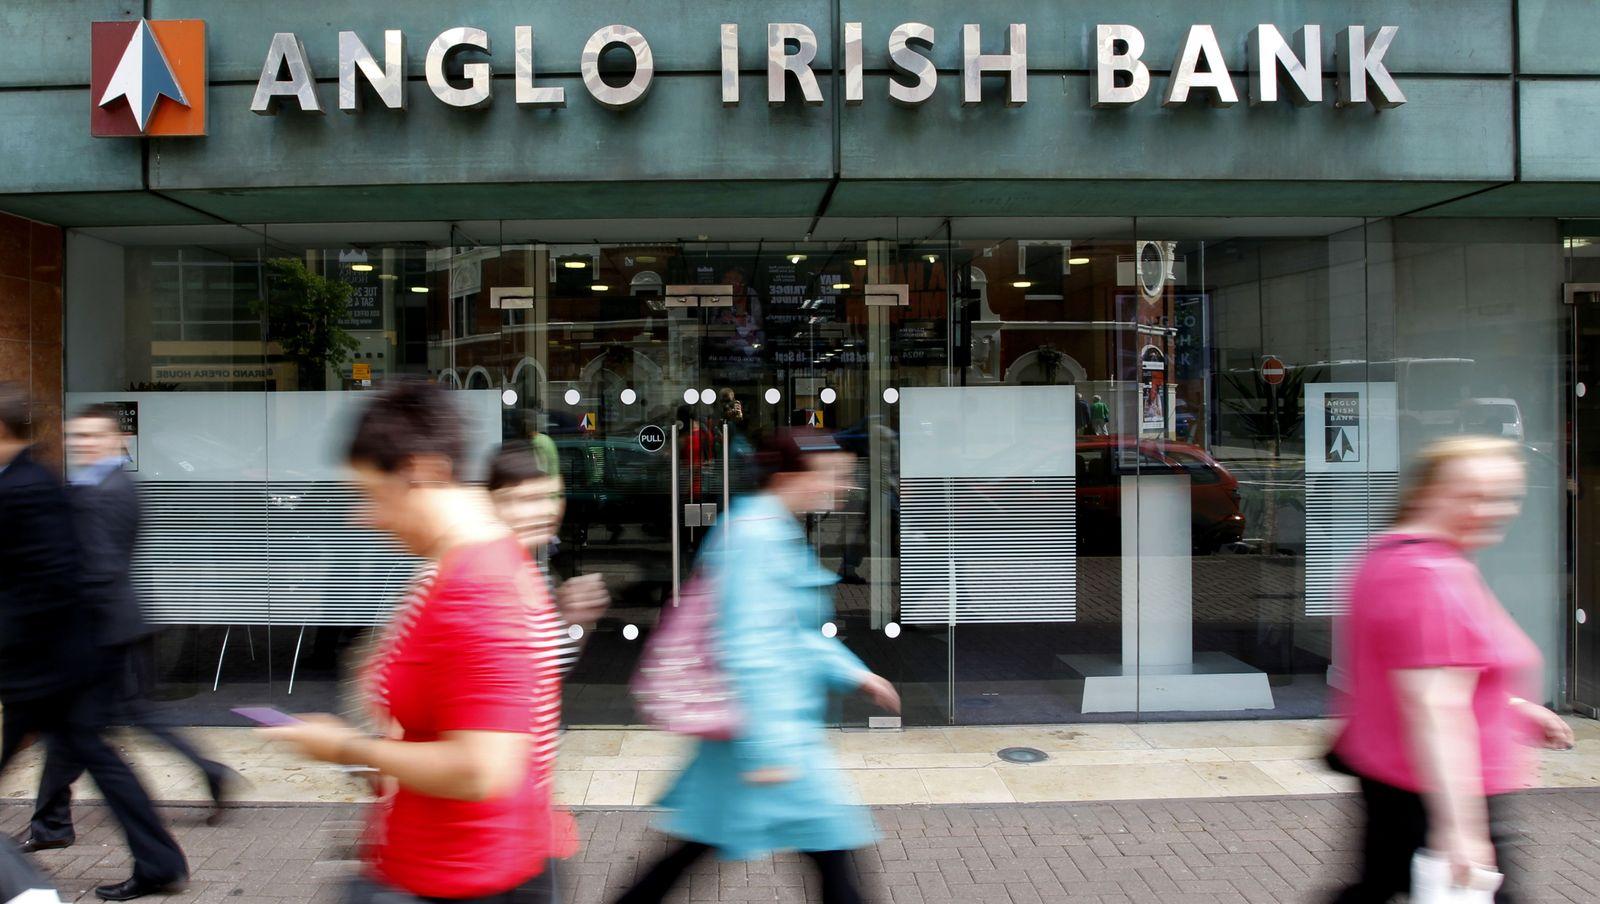 Ireland Paying The Bills / Anglo Irish Bank / Bank Irland